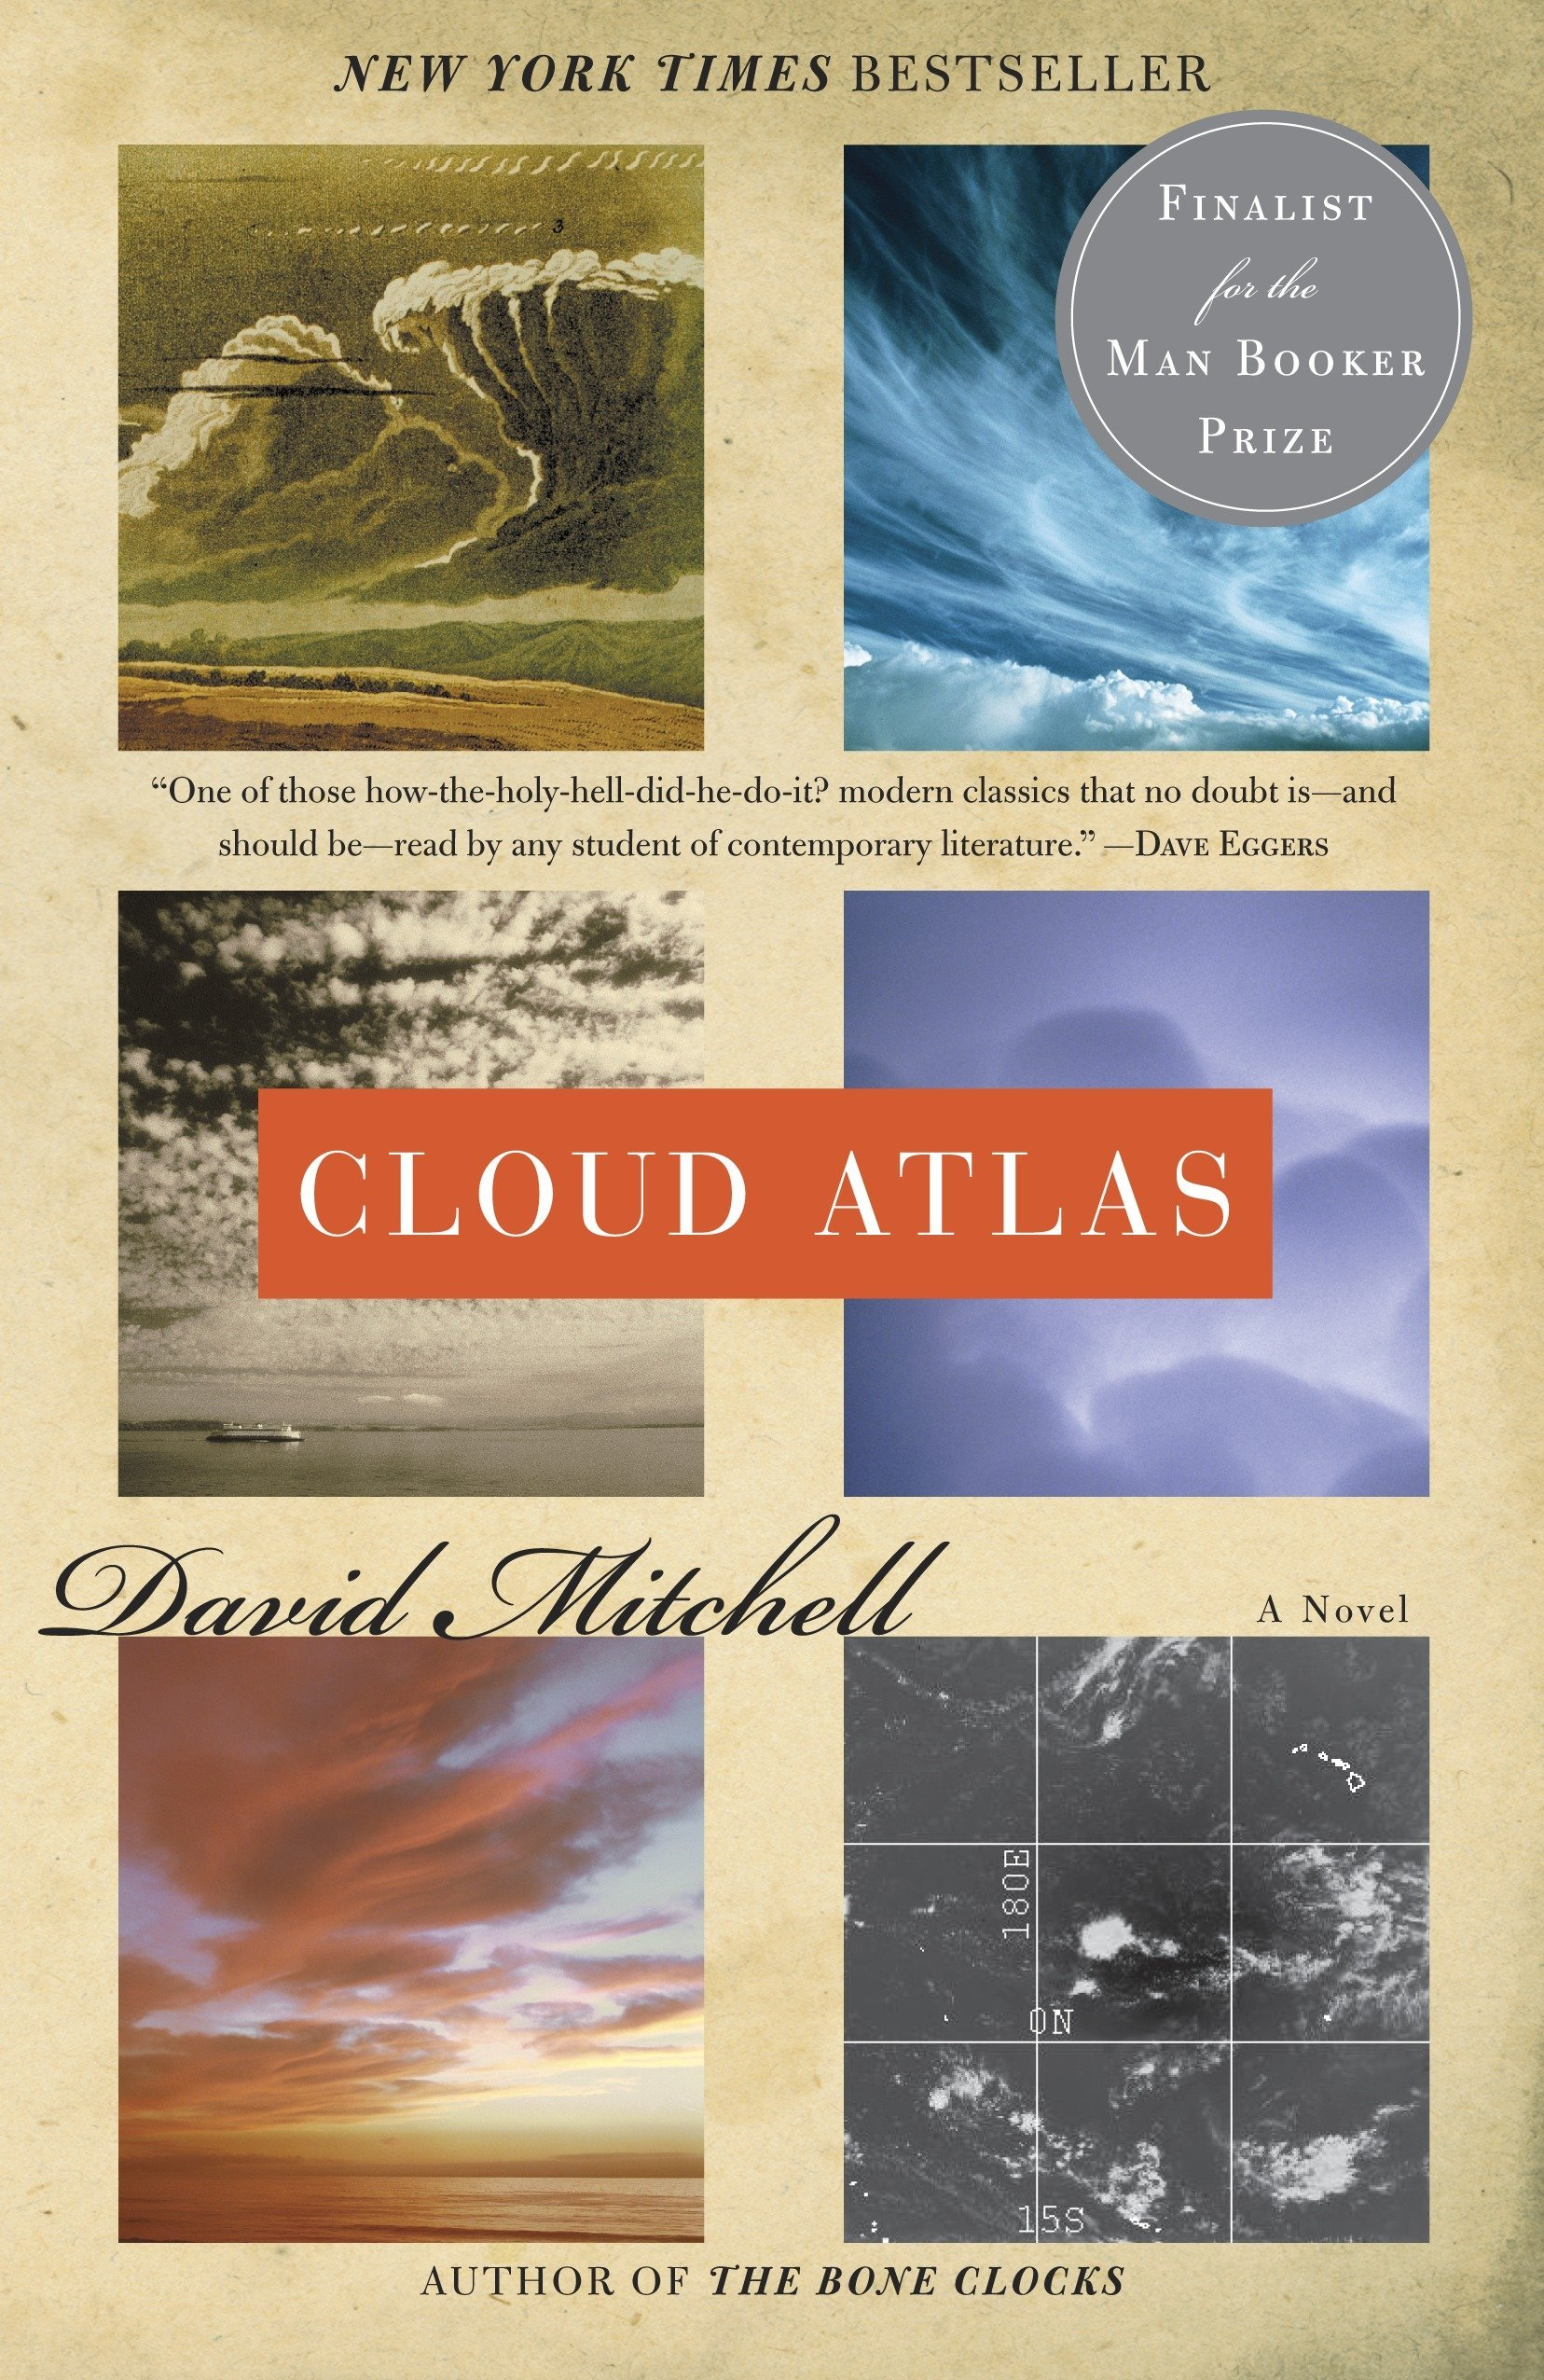 cloud atlas by david mitchell.jpg